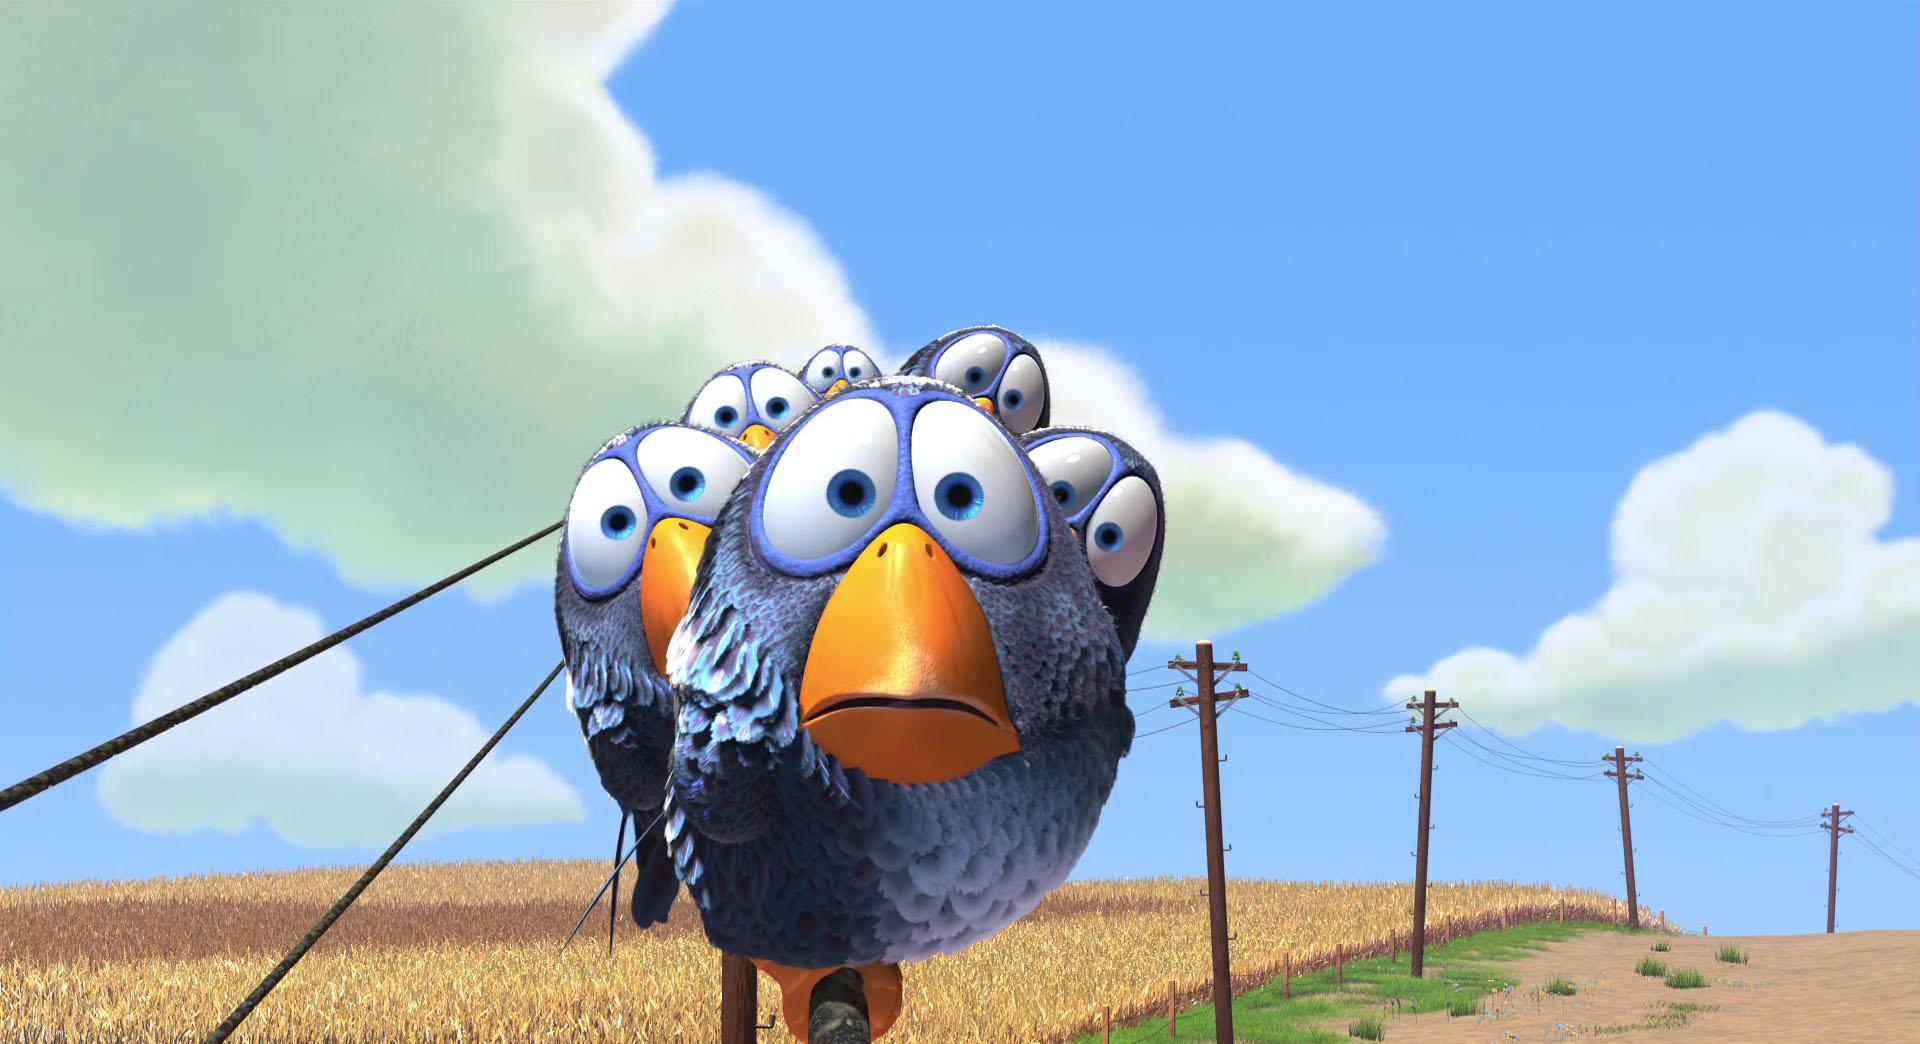 oiseau-personnage-drole-oiseau-ligne-haute-tension-02